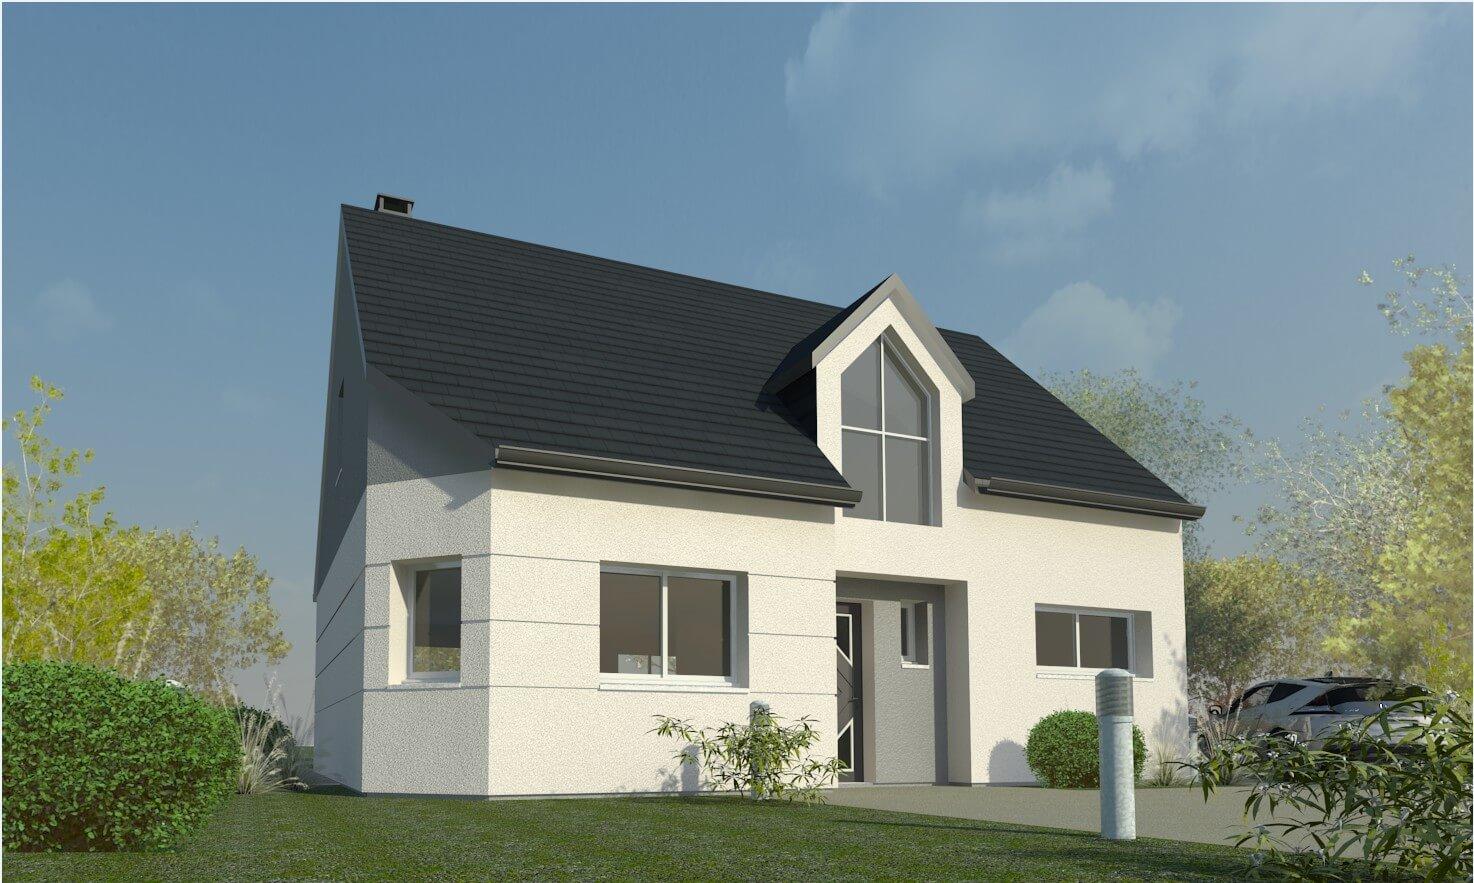 Plan maison 3 chambres Résidence Picarde 74